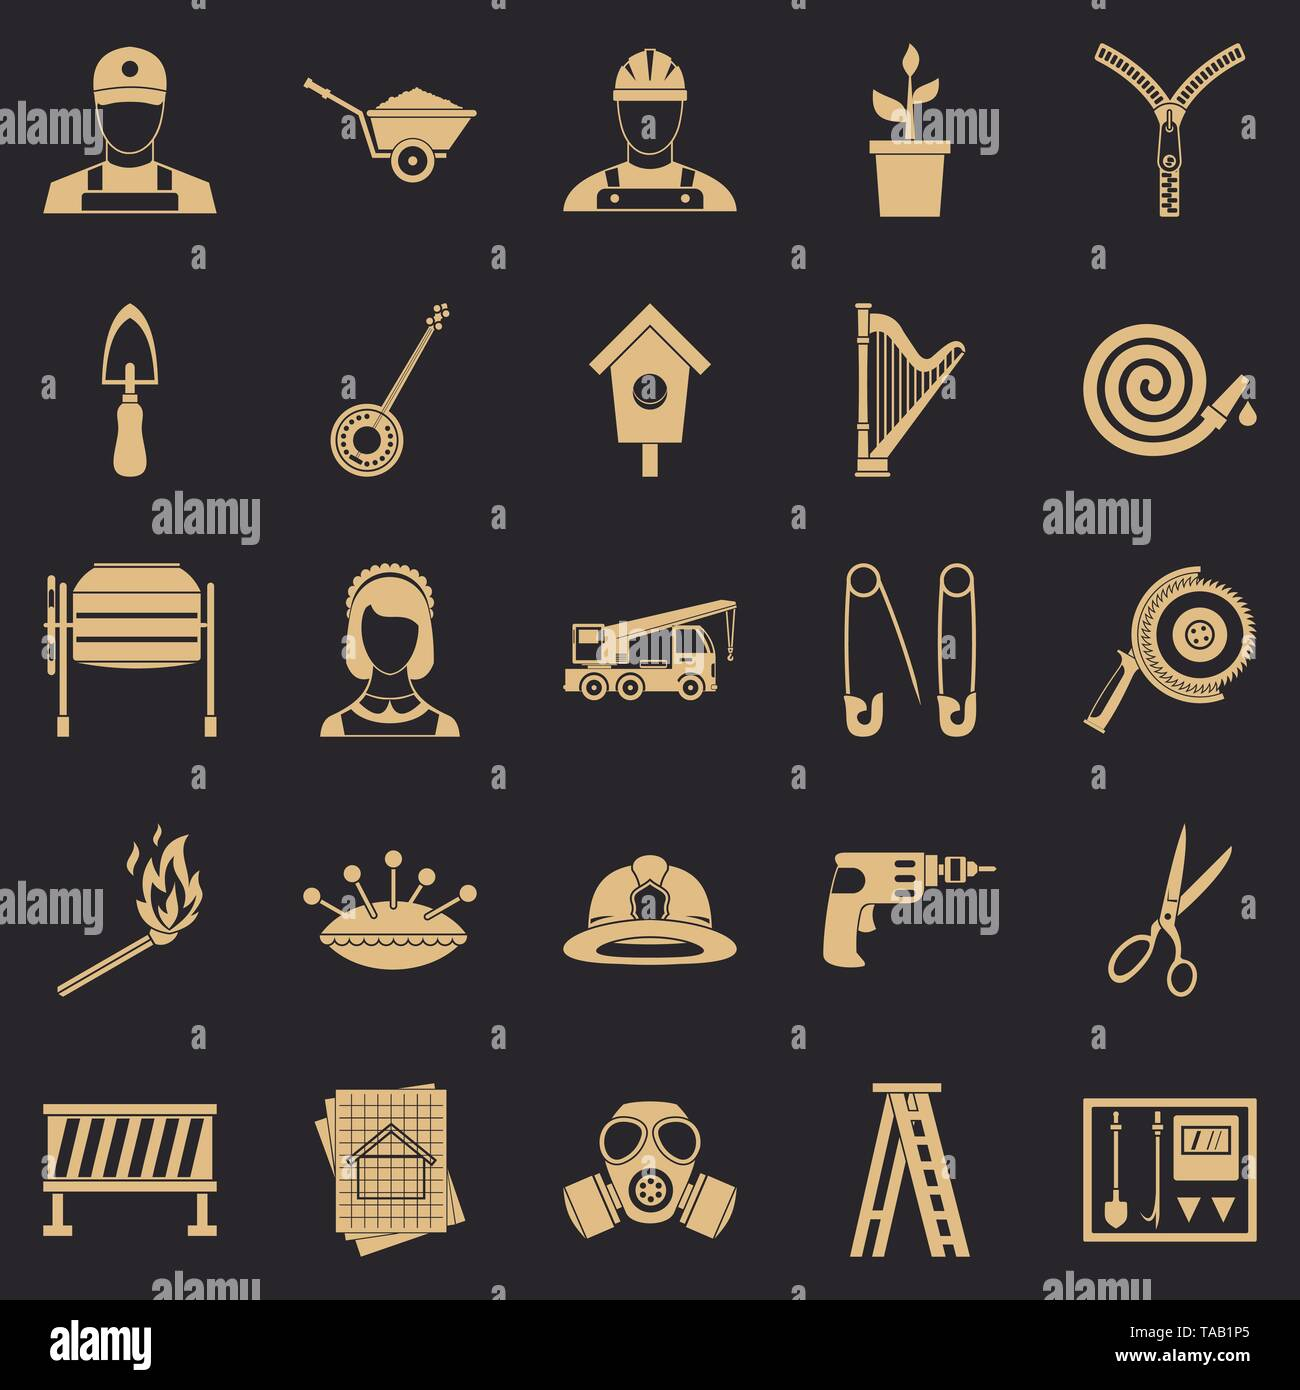 Engineering machine icons set, simple style - Stock Image